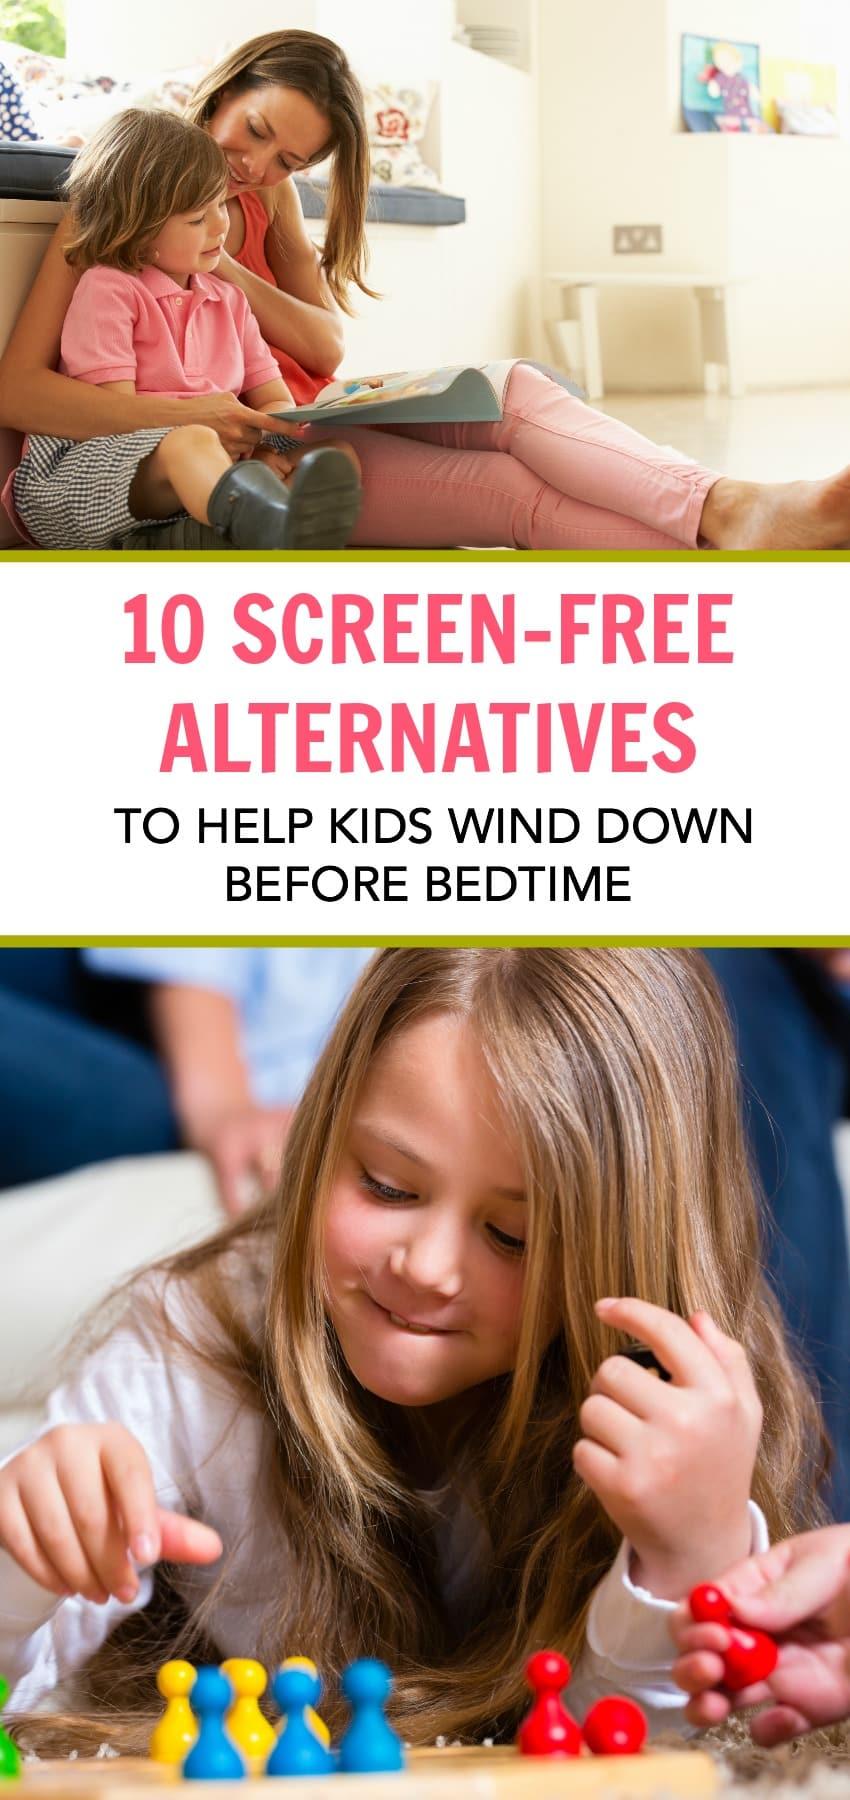 10 Screen-Free Alternatives Before Bedtime